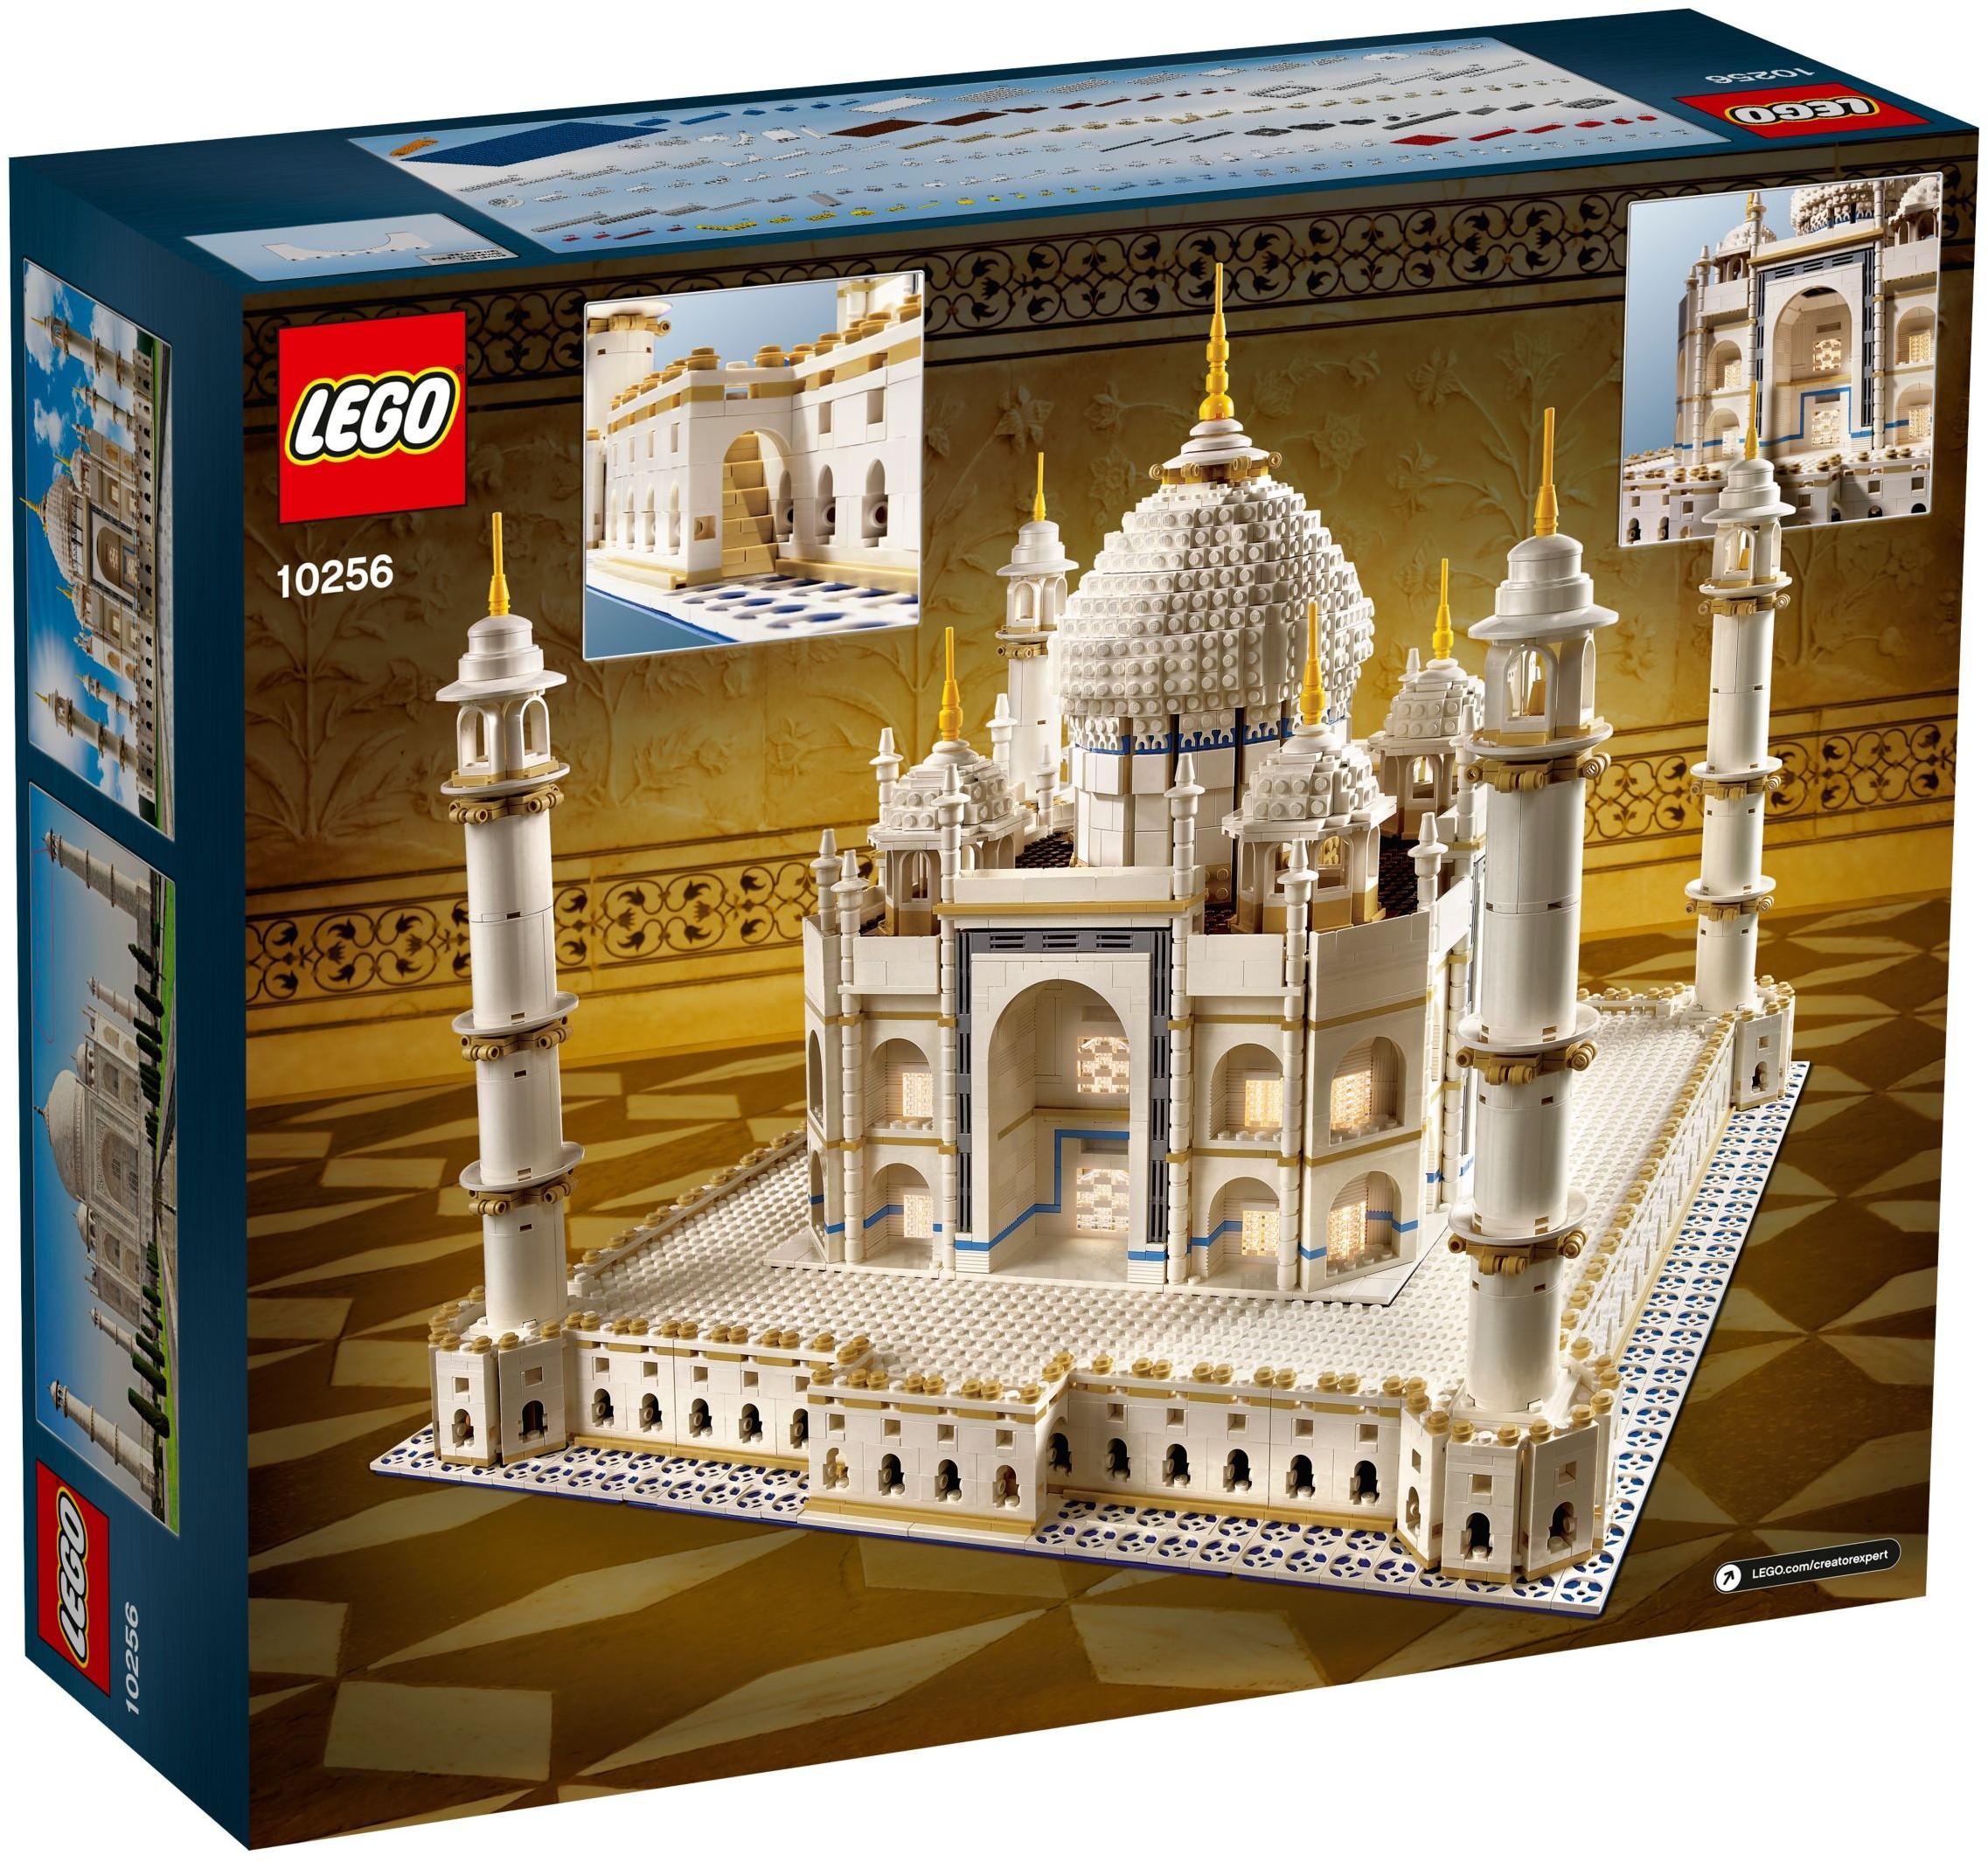 Lego creator expert taj mahal 10256 im lego online shop for Lago shop online